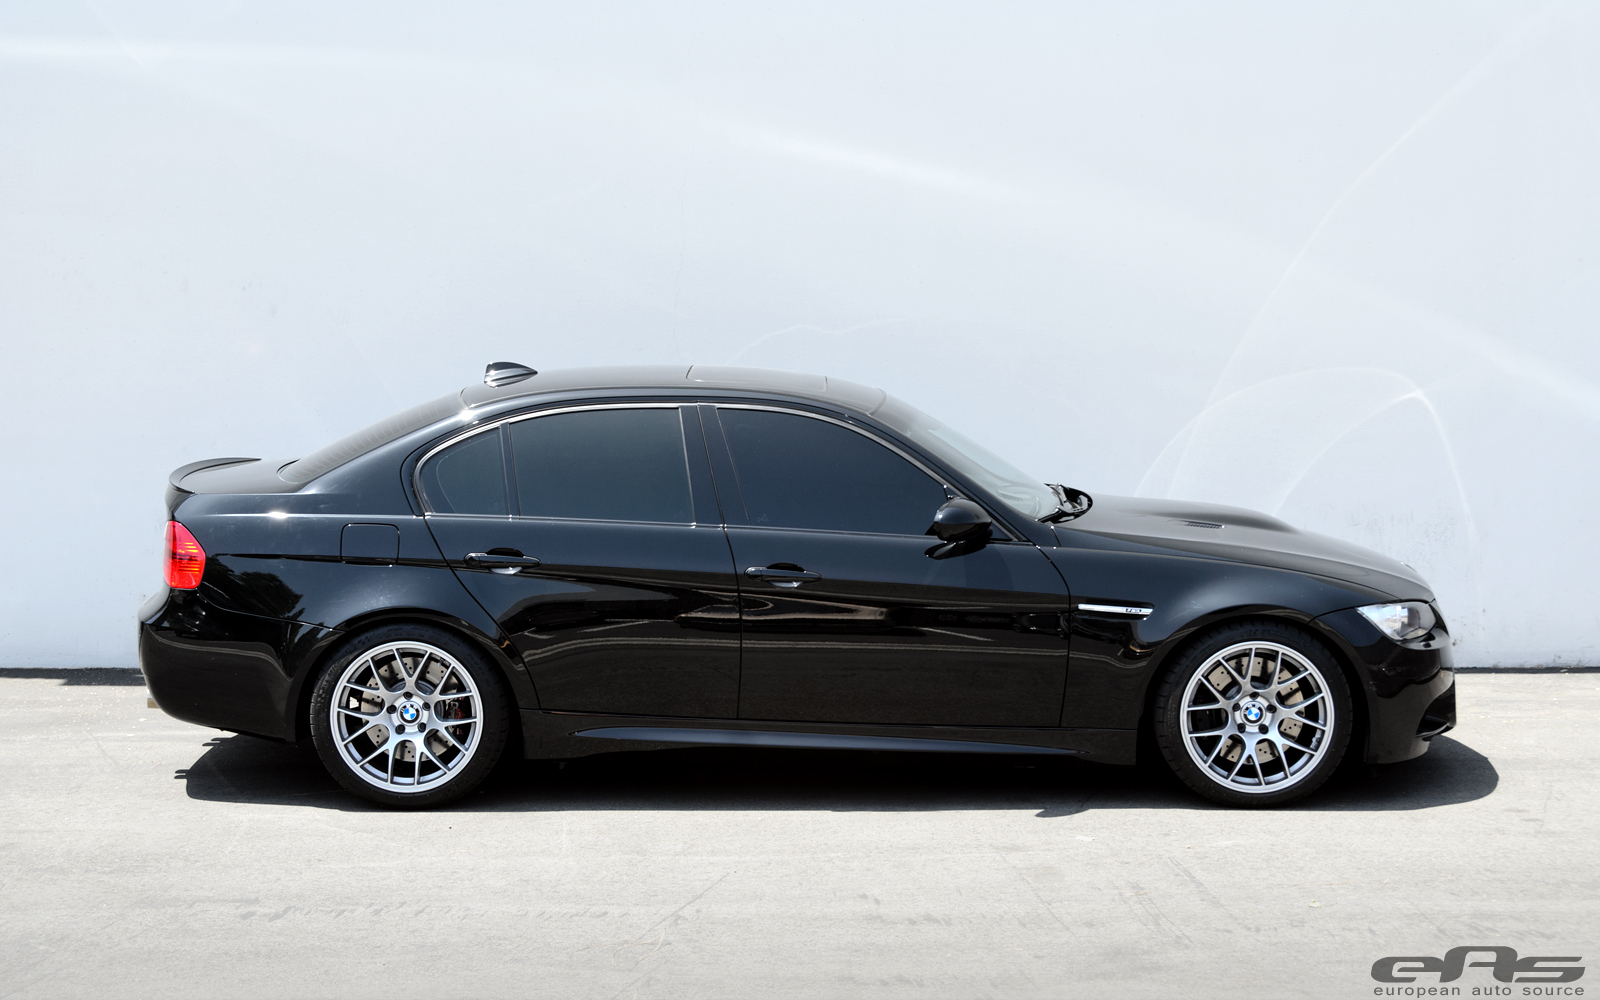 Bmw M5 Girl Wallpaper Eas Fits Jet Black Bmw E90 M3 With Apex Wheels Autoevolution